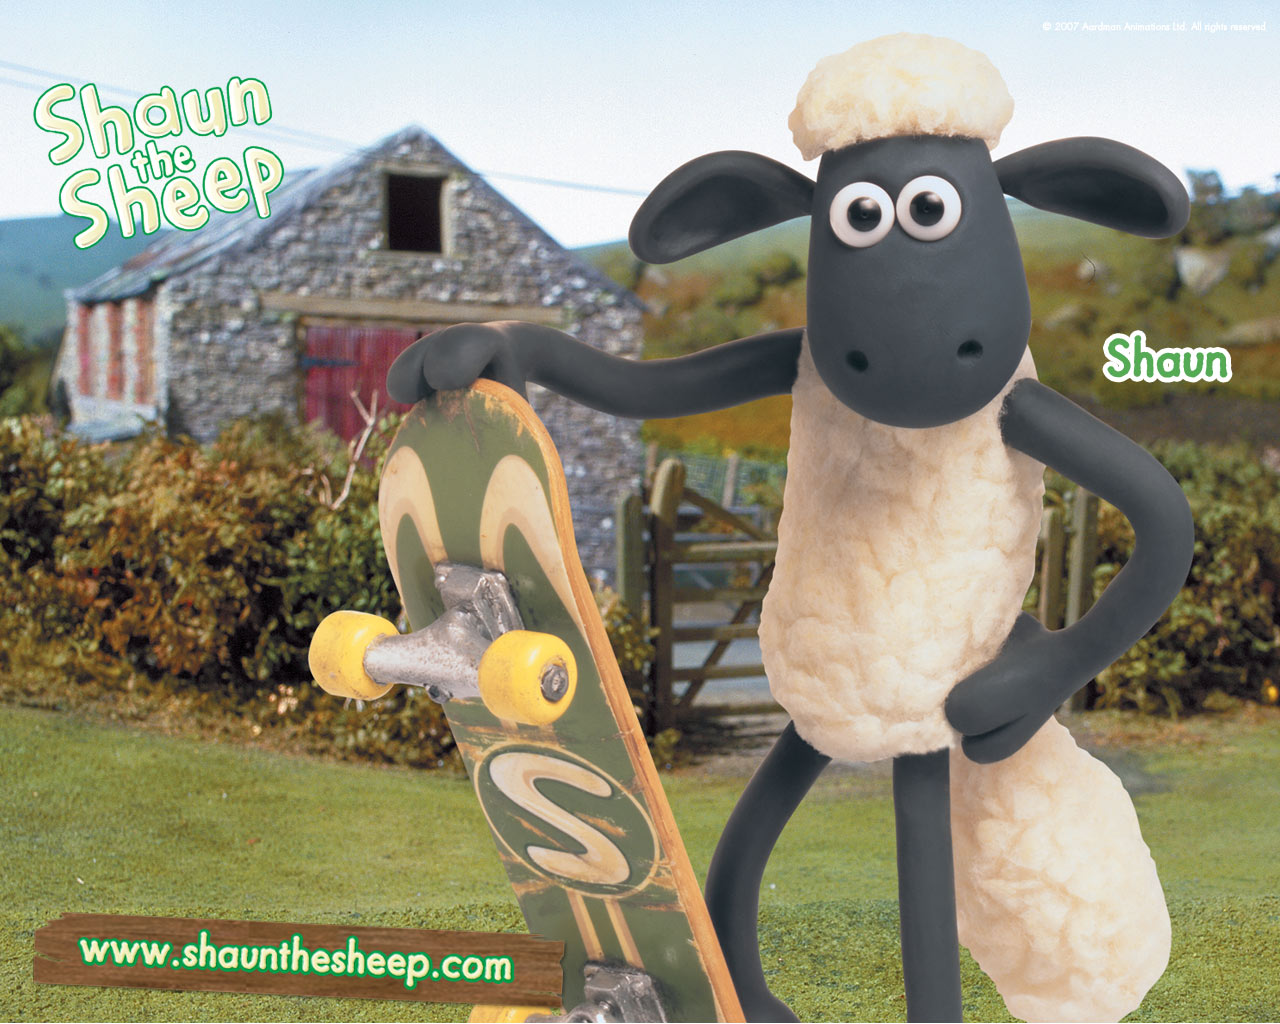 http://3.bp.blogspot.com/-jxkPQ_pav_4/UFgMeAmee1I/AAAAAAAAAUo/0CmiTH3N4aw/s1600/Shaun+the+Sheep+Wallpaper+top.jpg